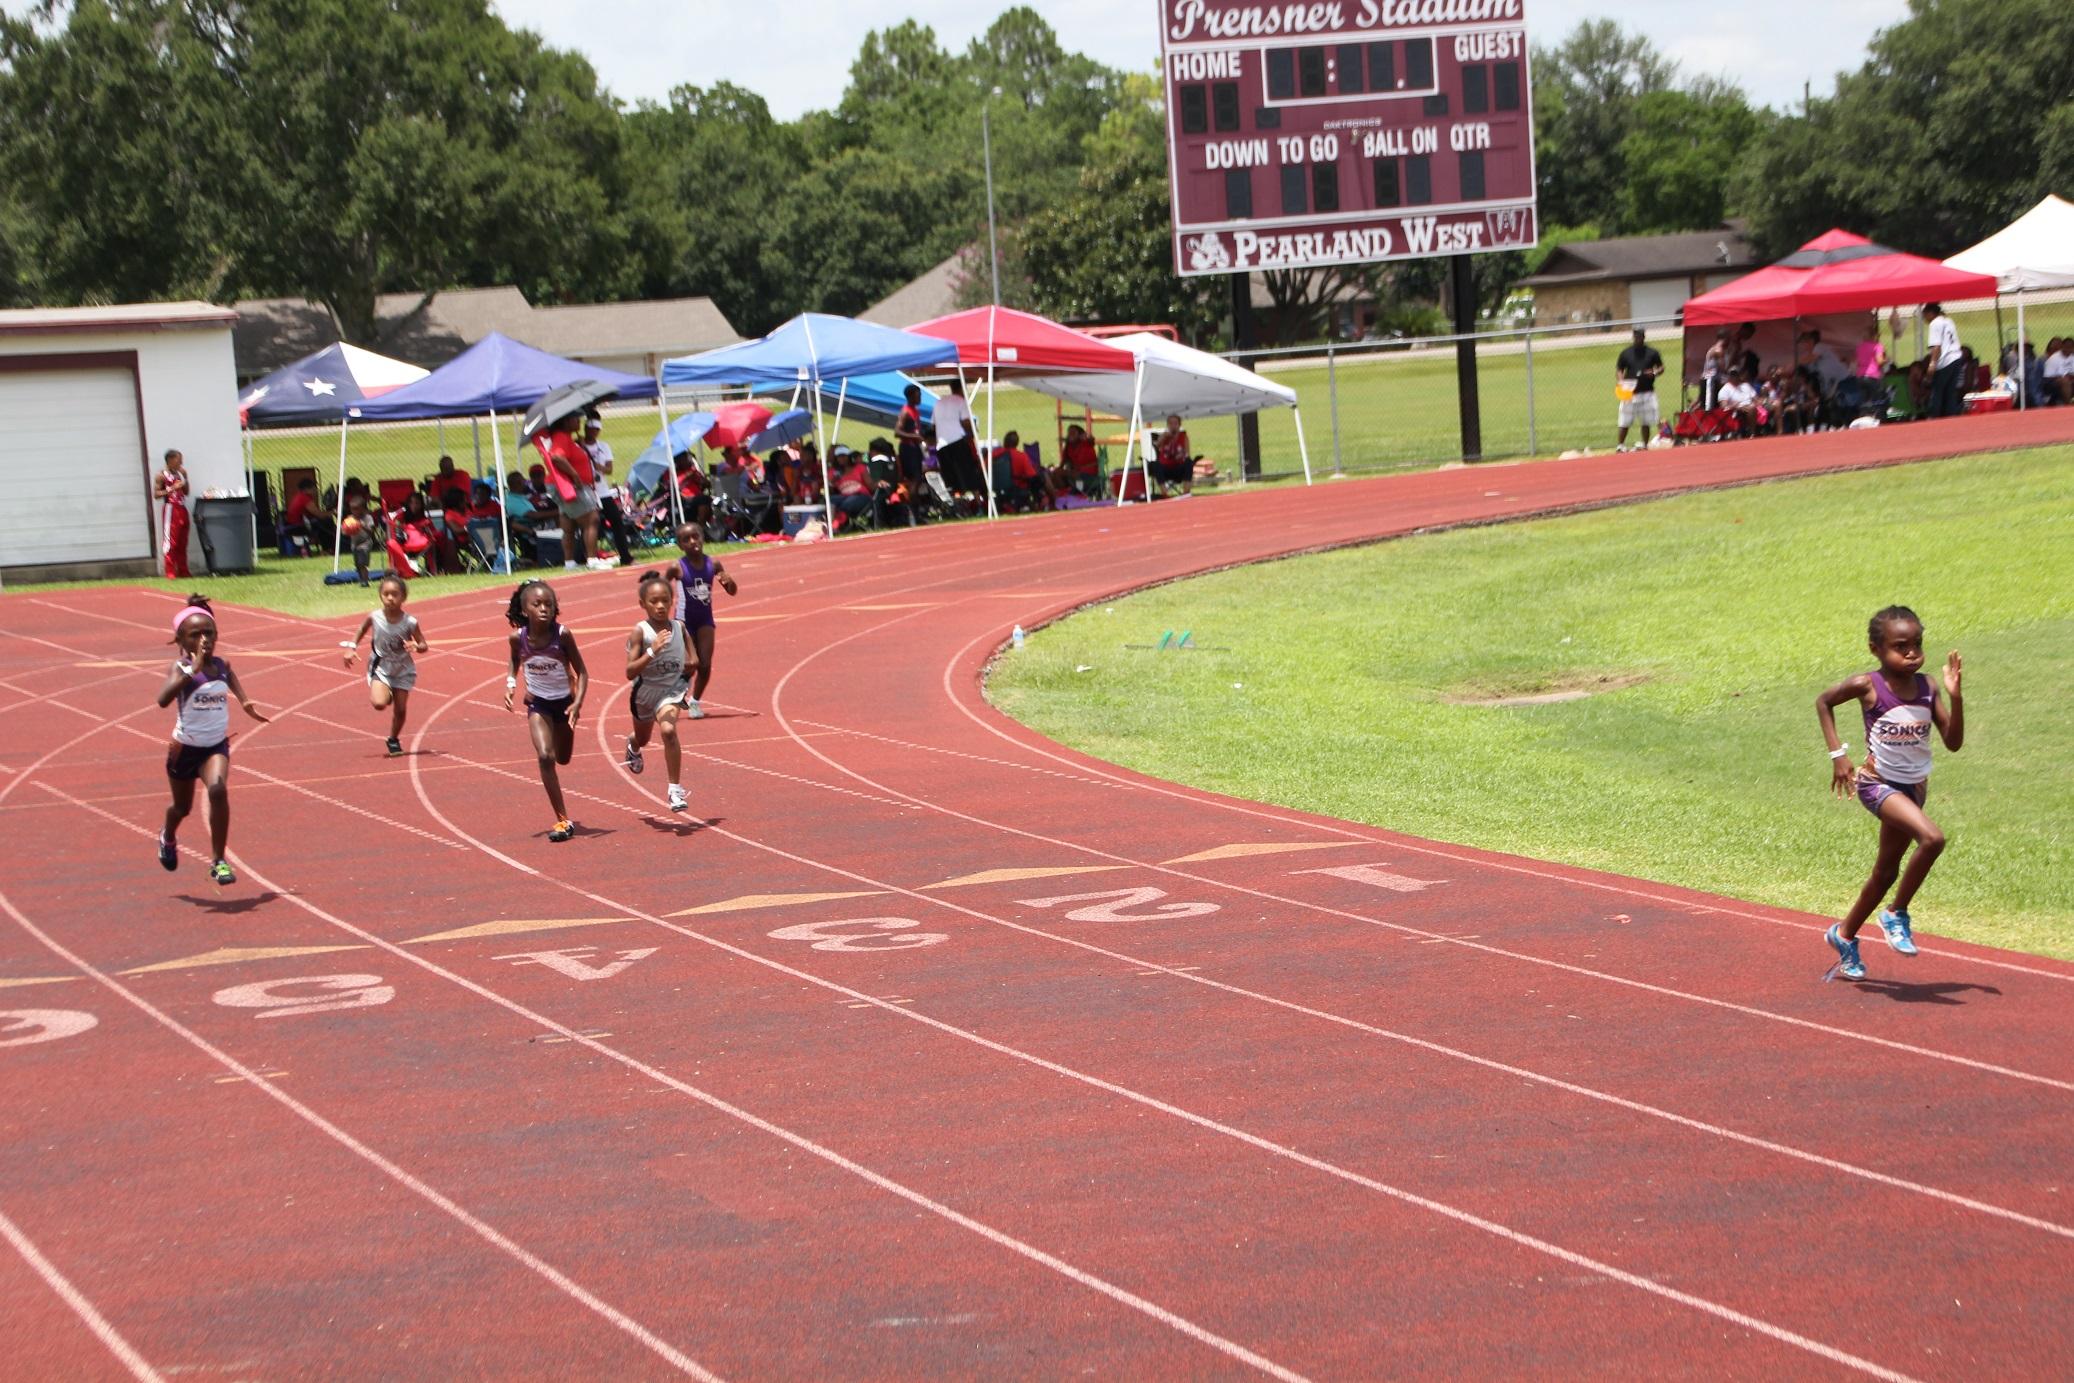 Ryann, Amelia, and Kylah running the 400m